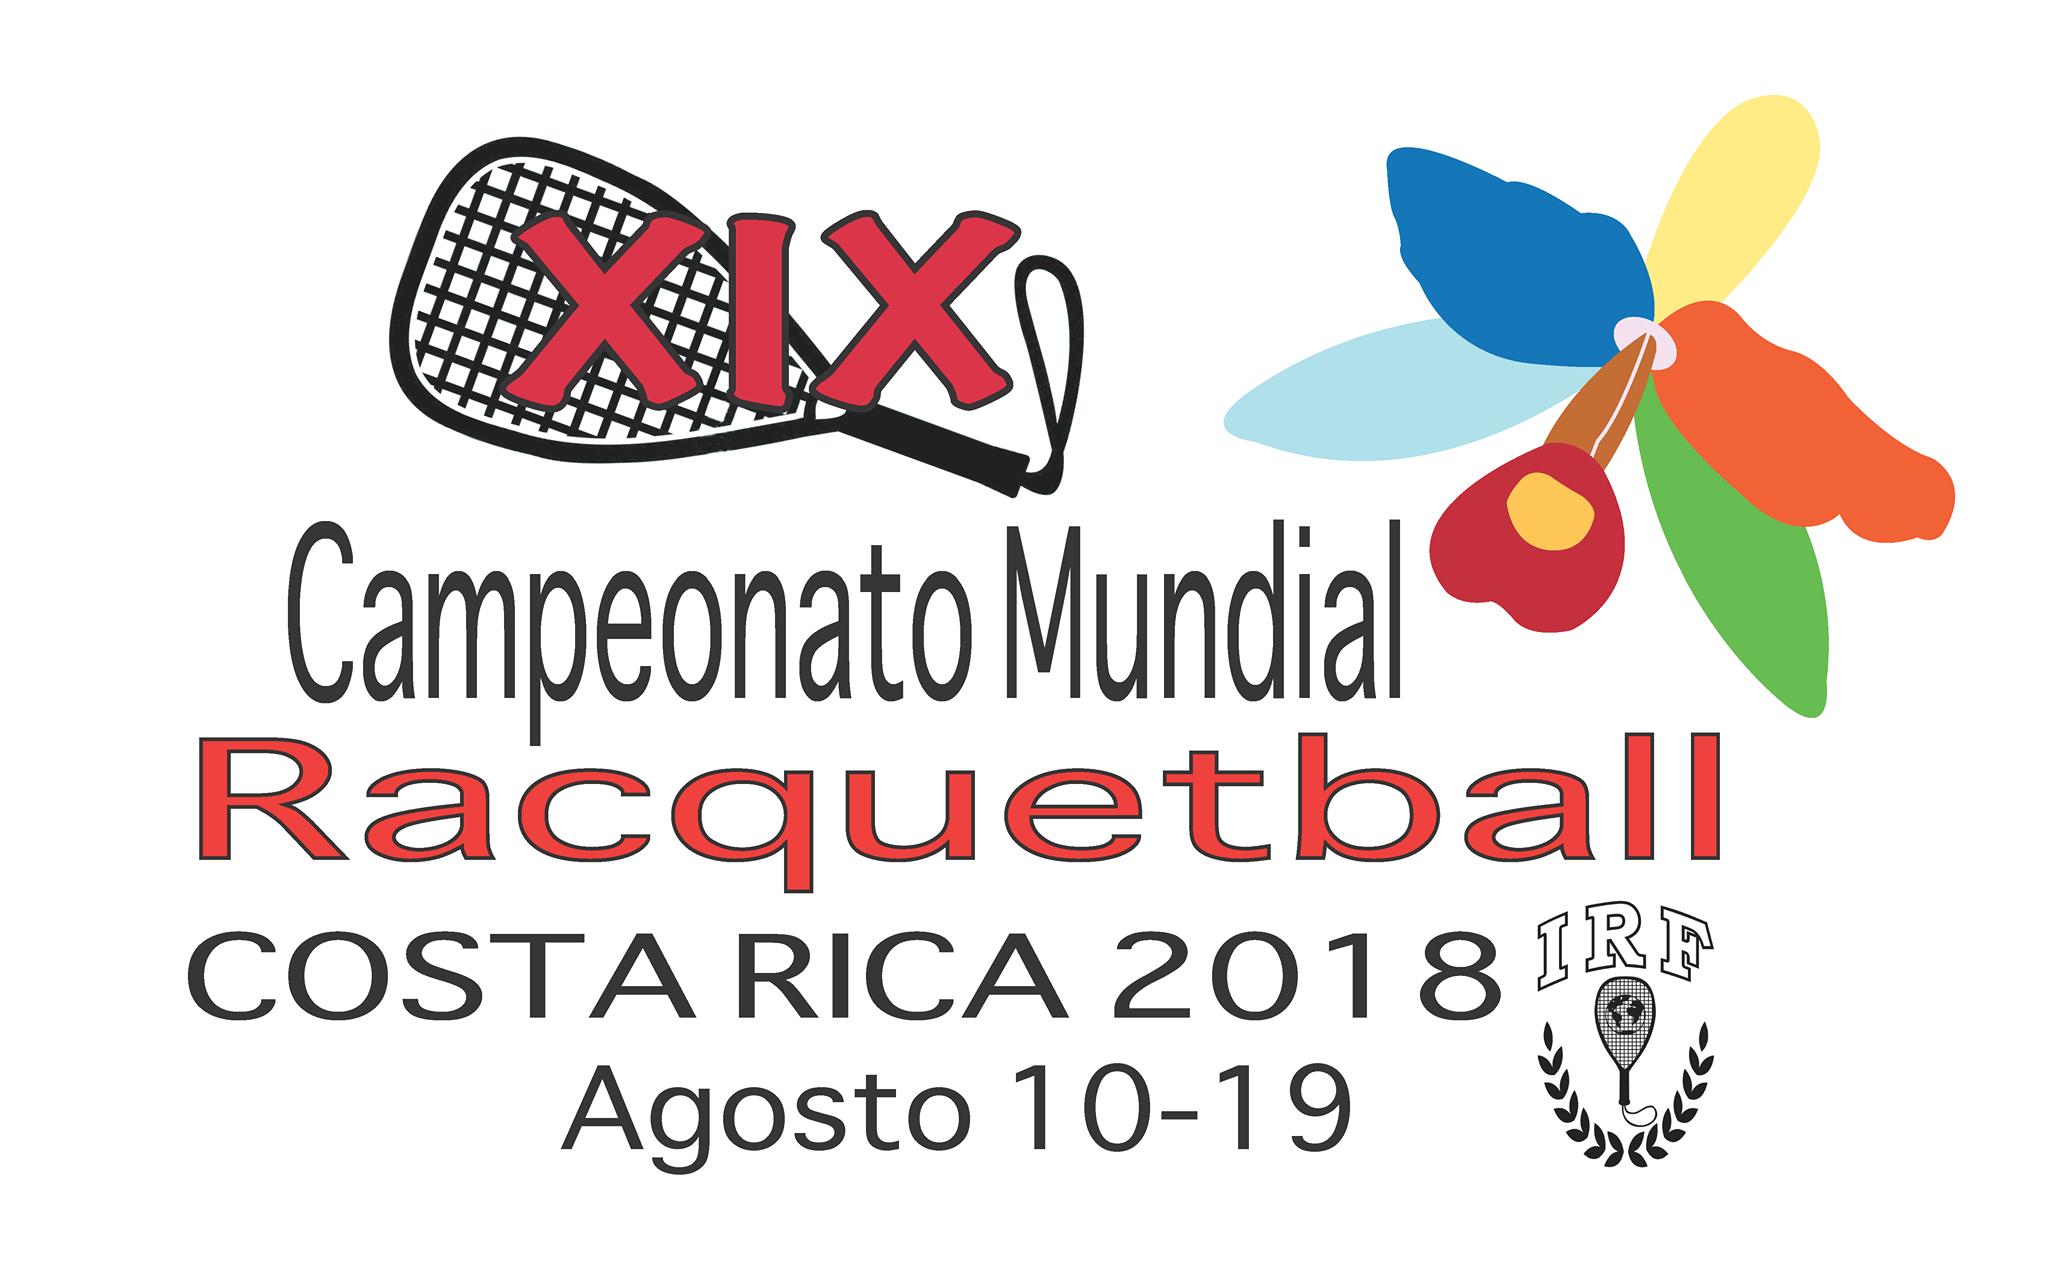 Costa Rica 2018 World Racquetball Championship